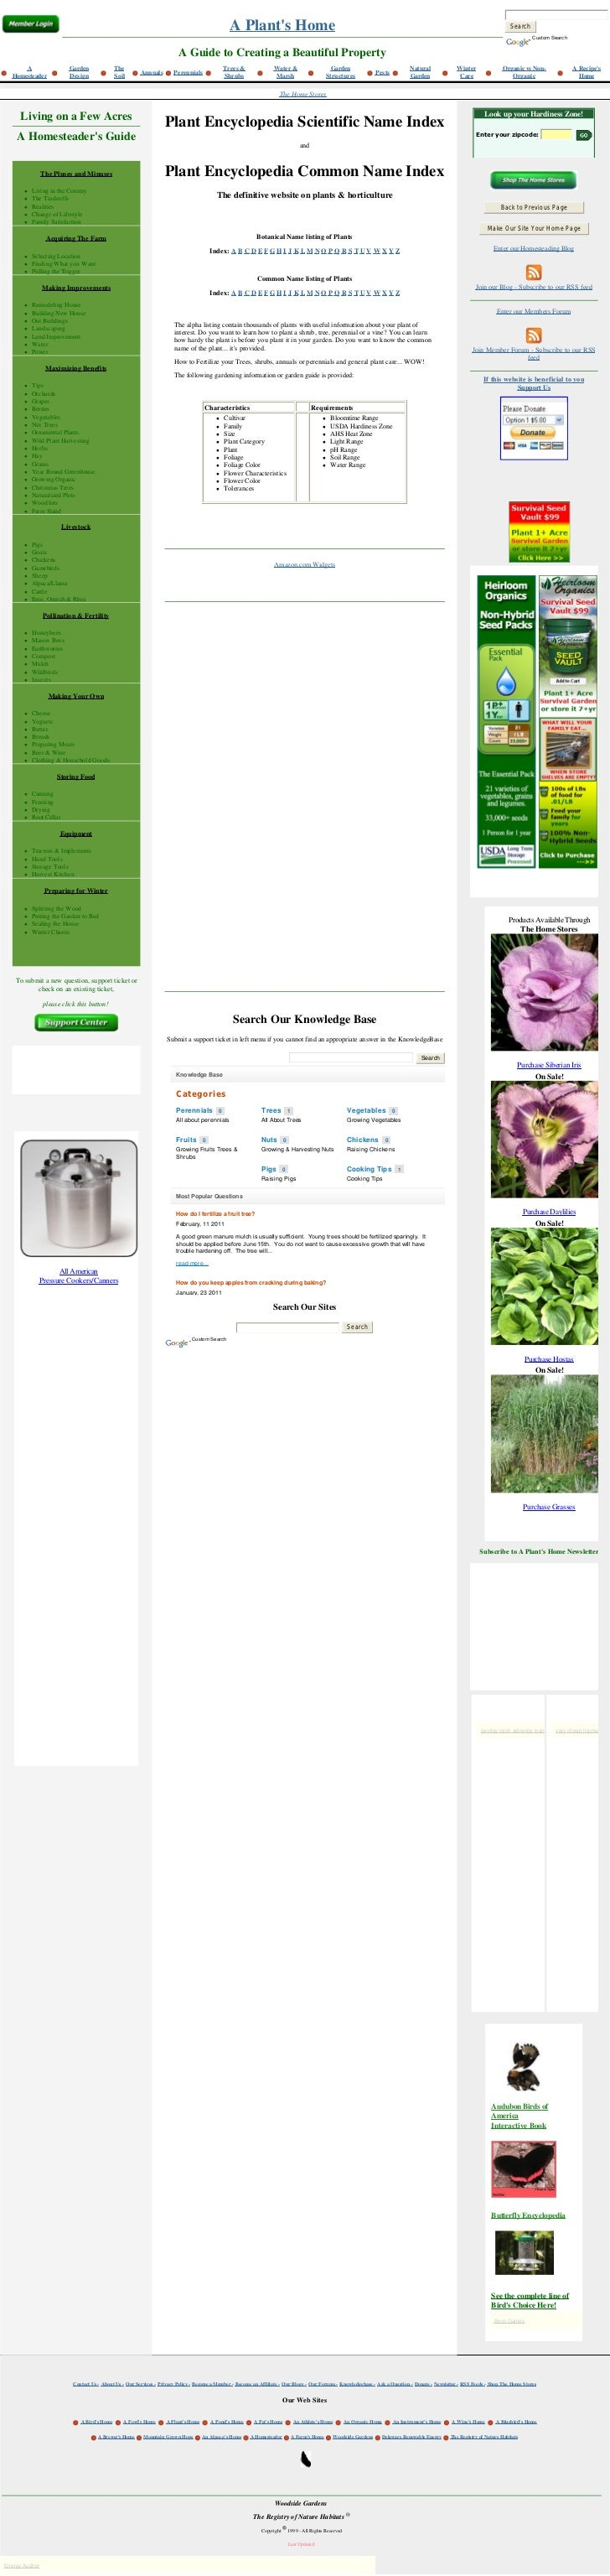 Plant Encyclopedia Scientific Name Index and Plant Encyclopedia Common Name Index. Links to 1000's of plant descriptions.